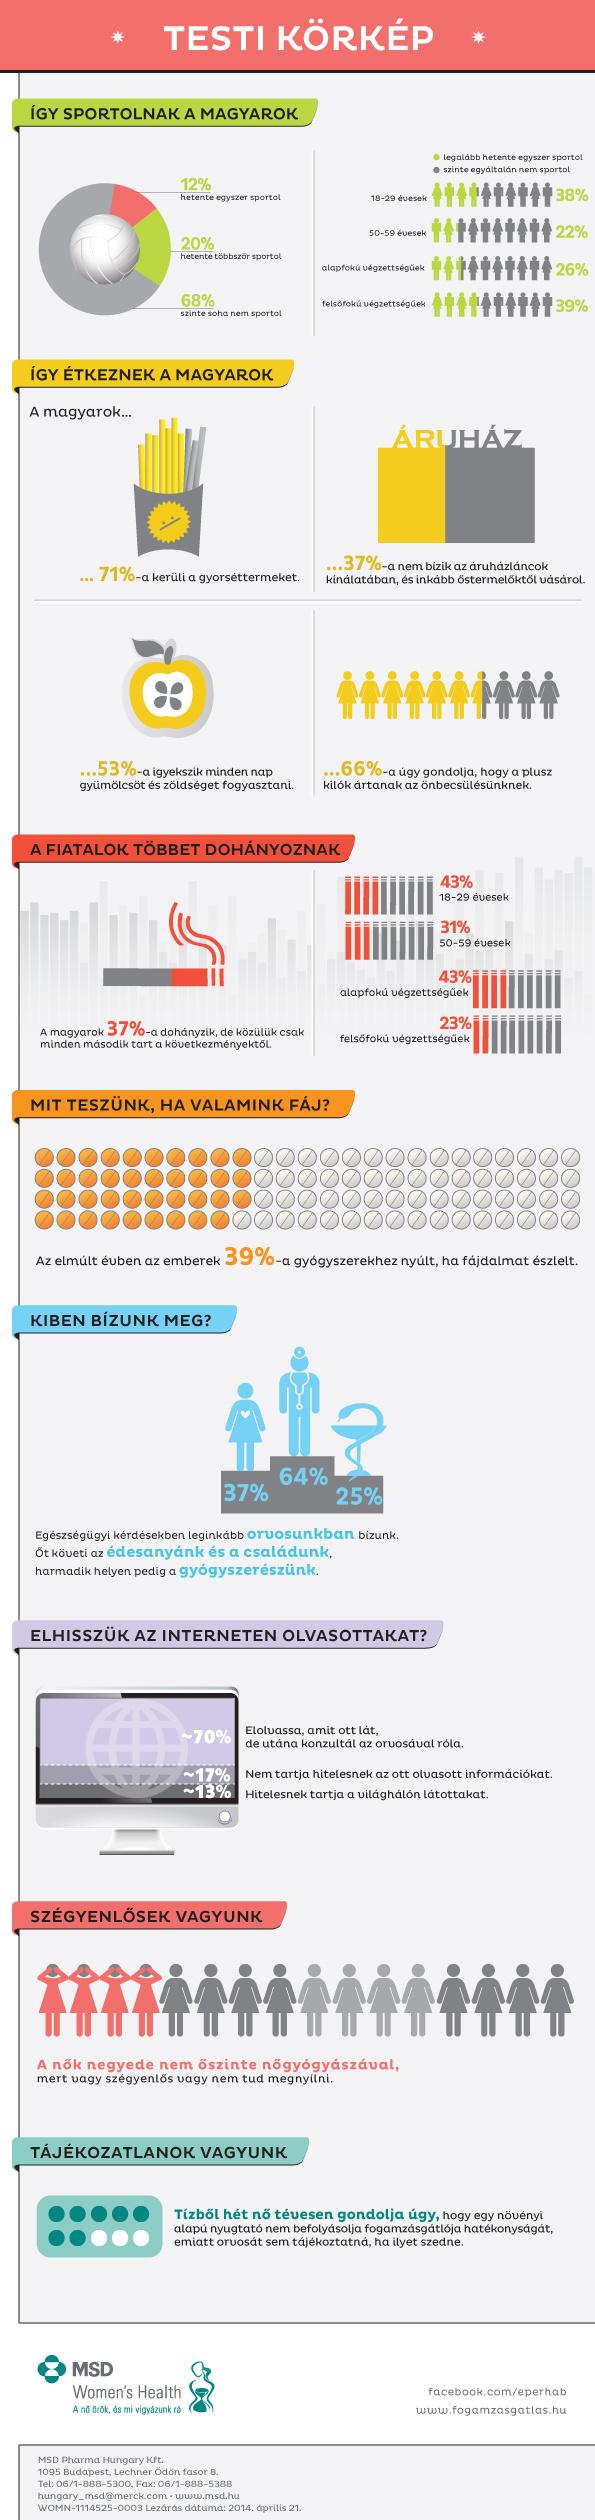 msd testi korkep infografika 20140430